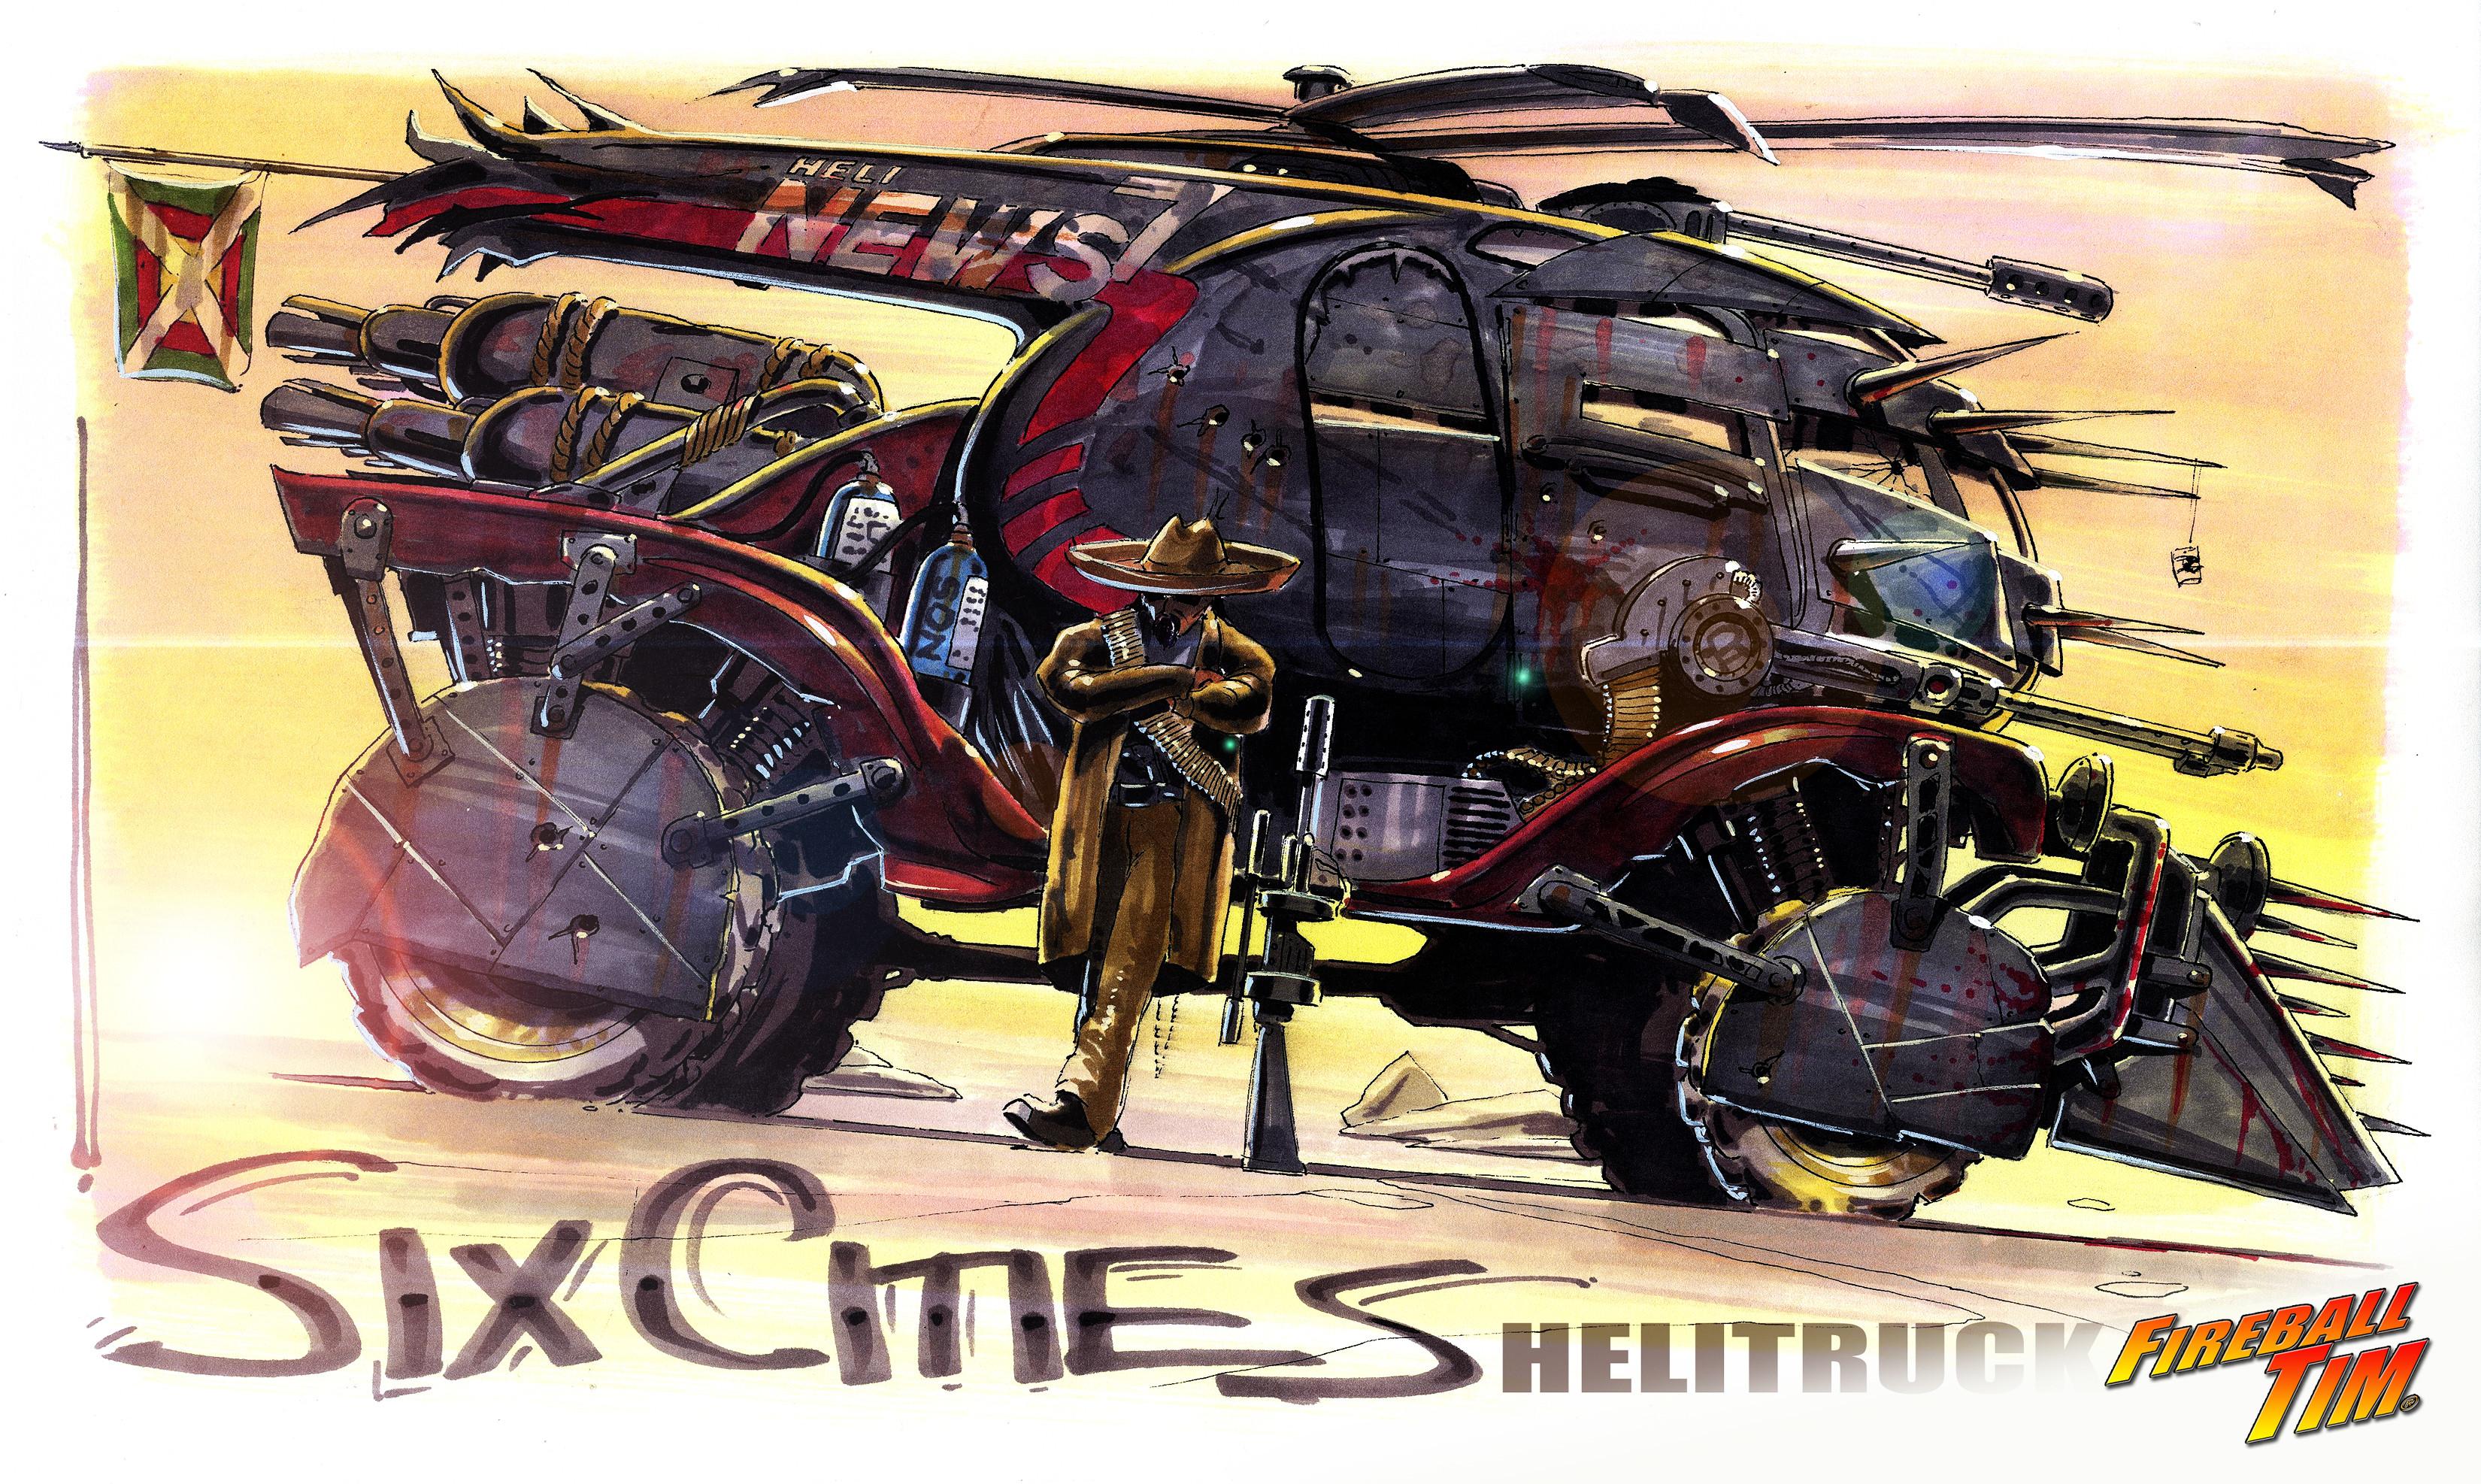 SIX CITIES